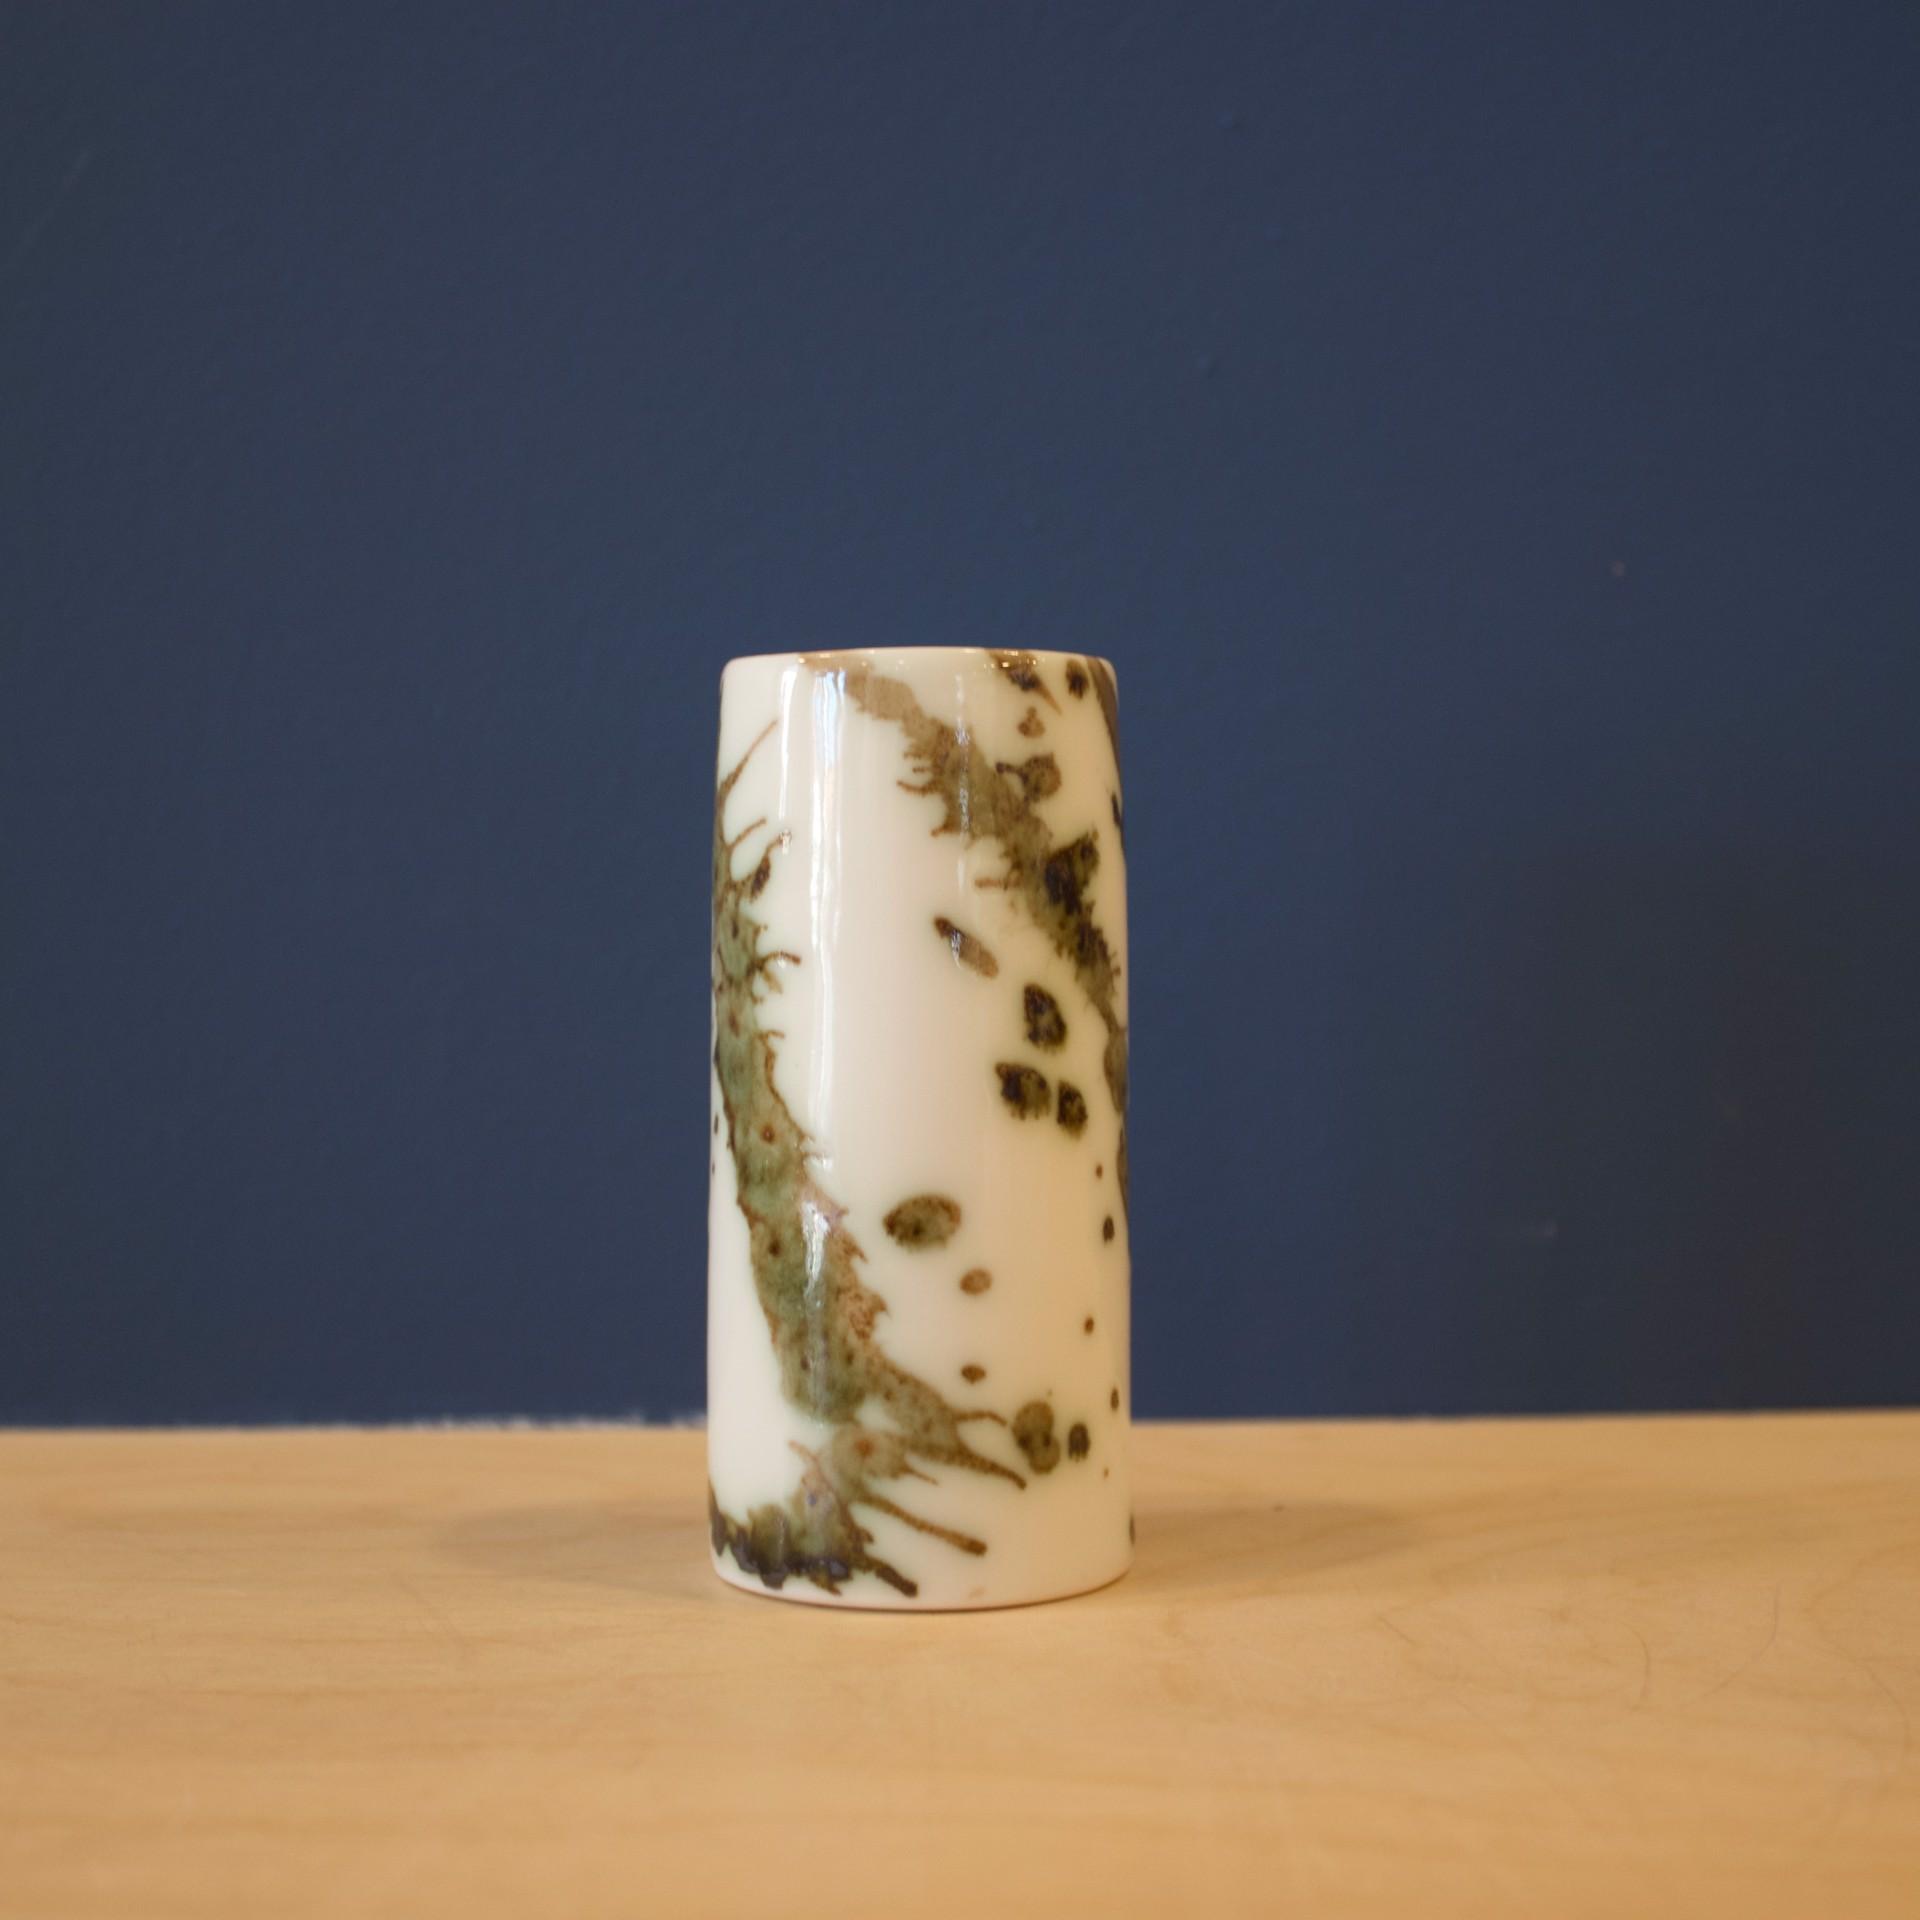 Small Splash Cylinder  by Patricia Thom